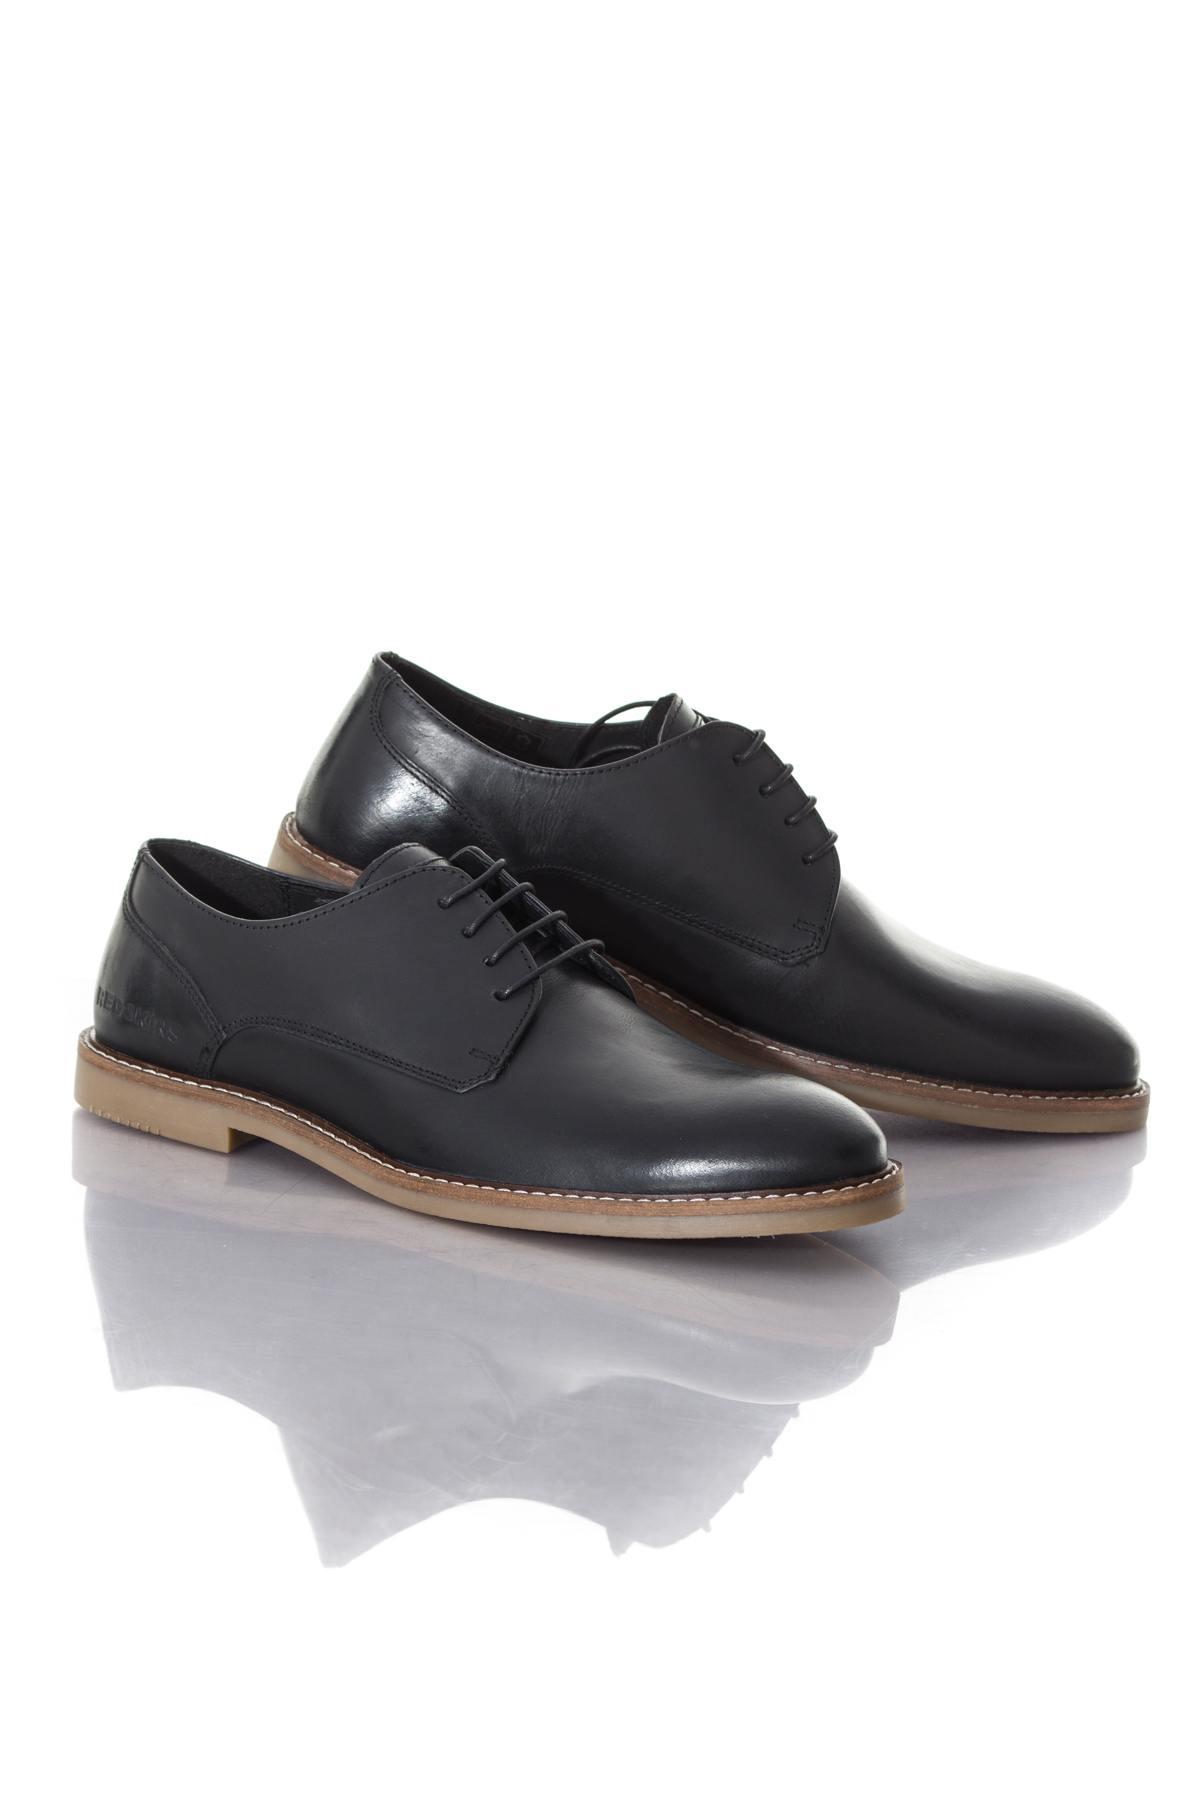 chaussures homme chaussures redskins wandor noir cuir. Black Bedroom Furniture Sets. Home Design Ideas